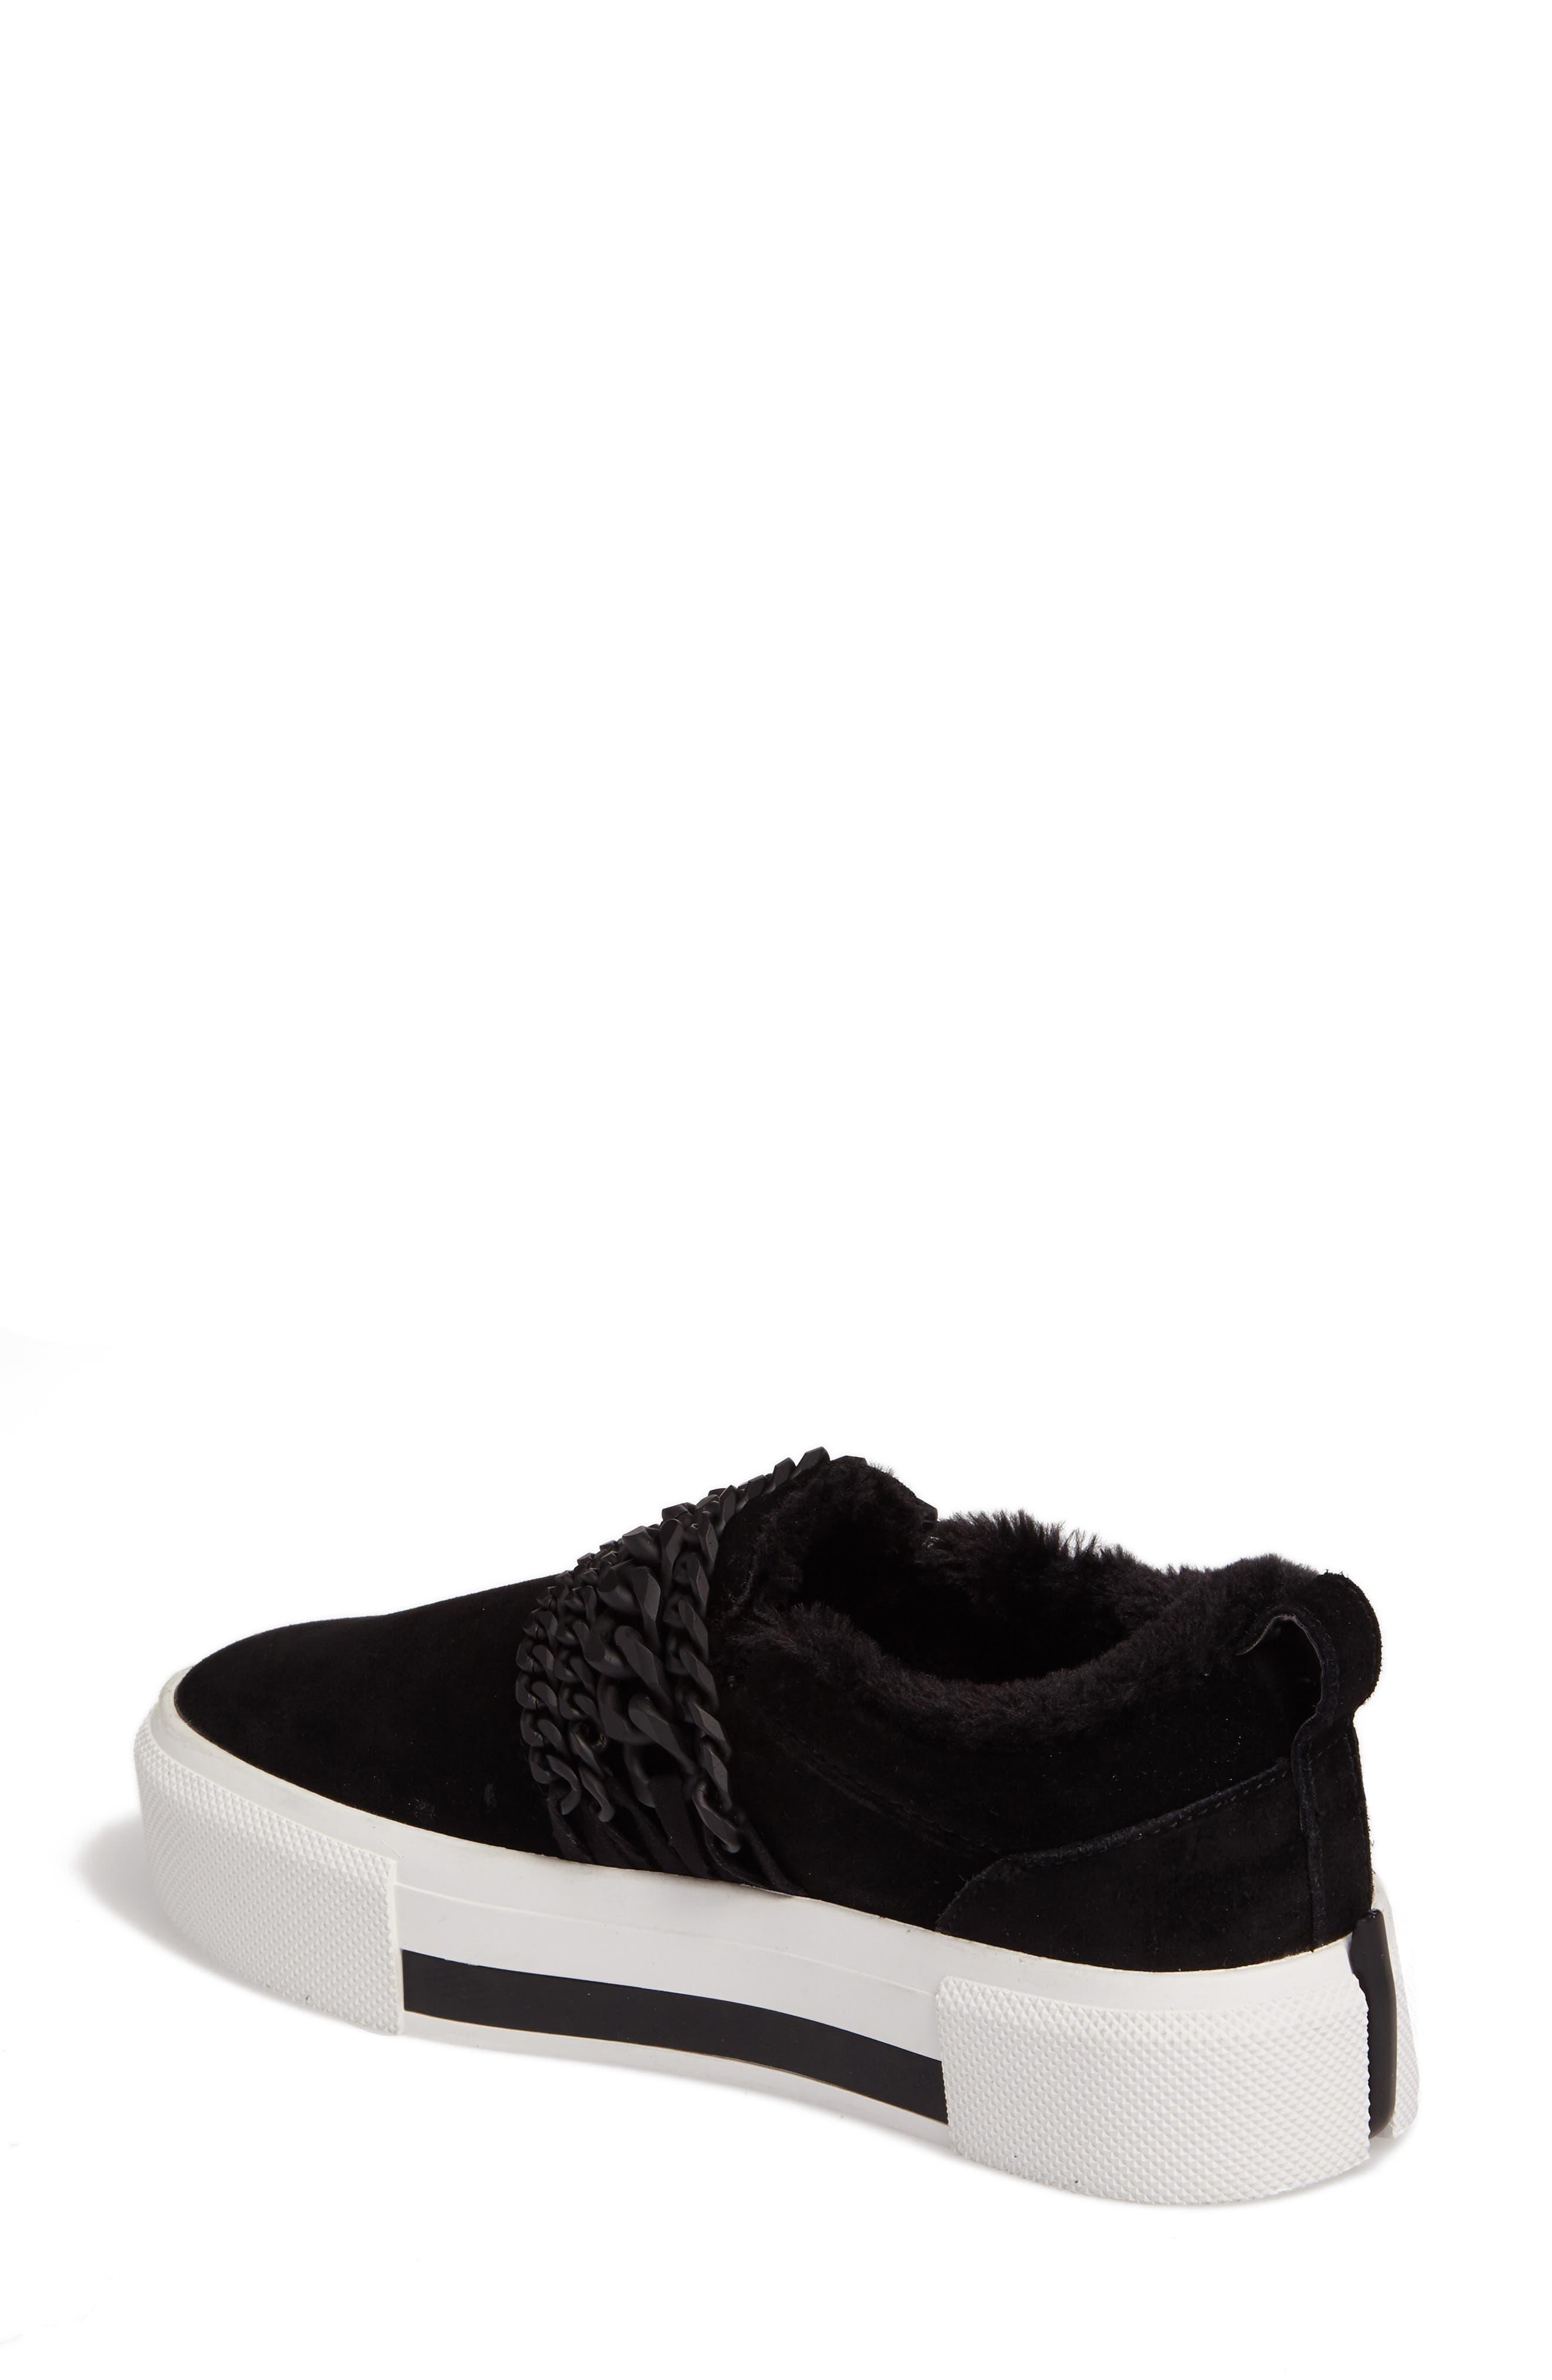 Tory Platform Sneaker,                             Alternate thumbnail 2, color,                             Black